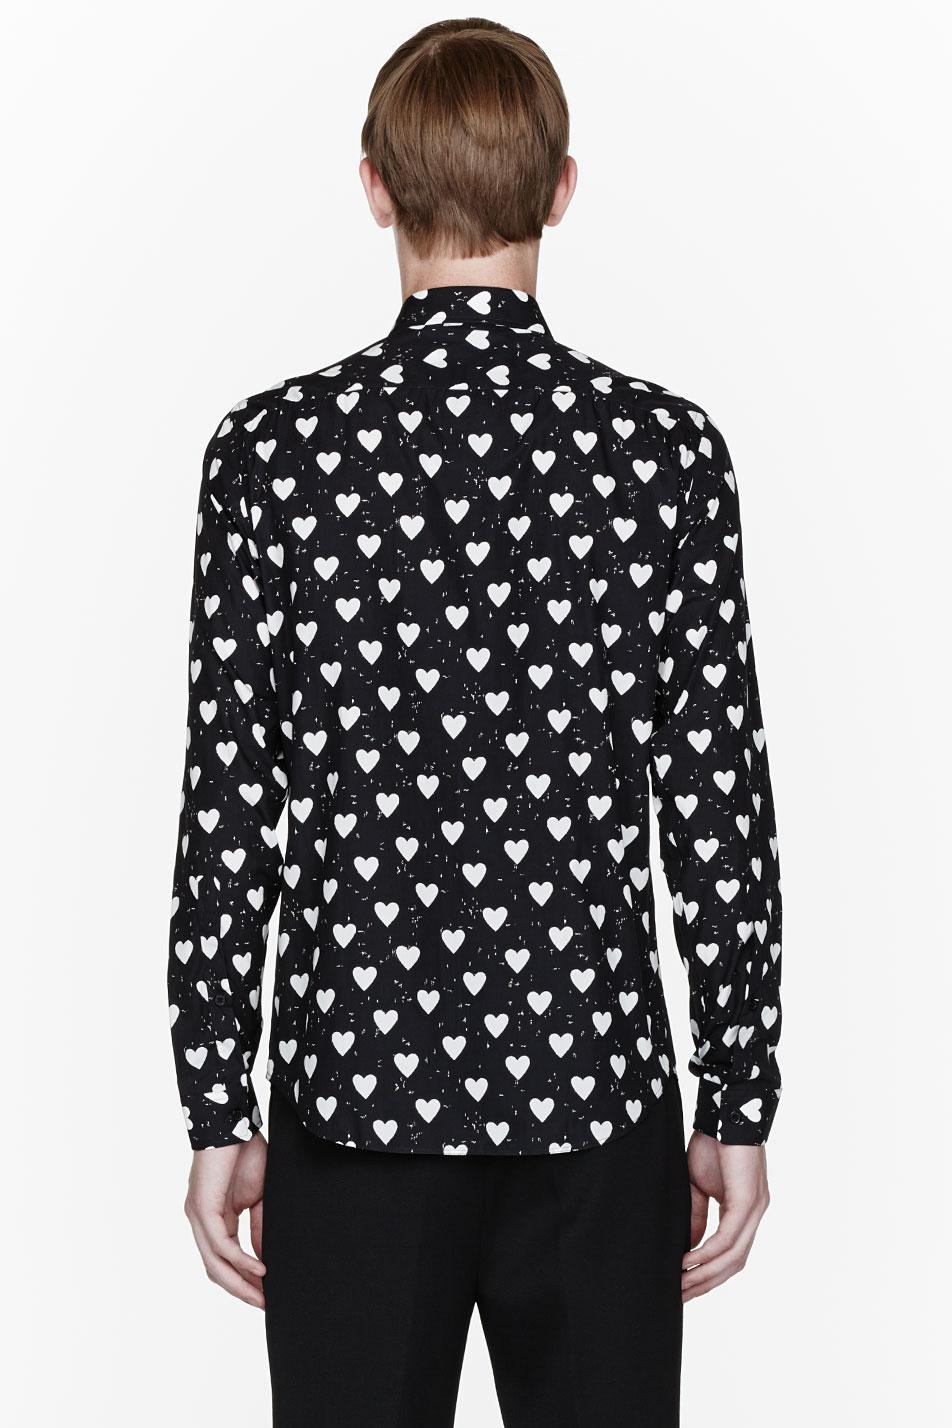 Lyst Burberry Prorsum Black Heart Print Shirt In Black